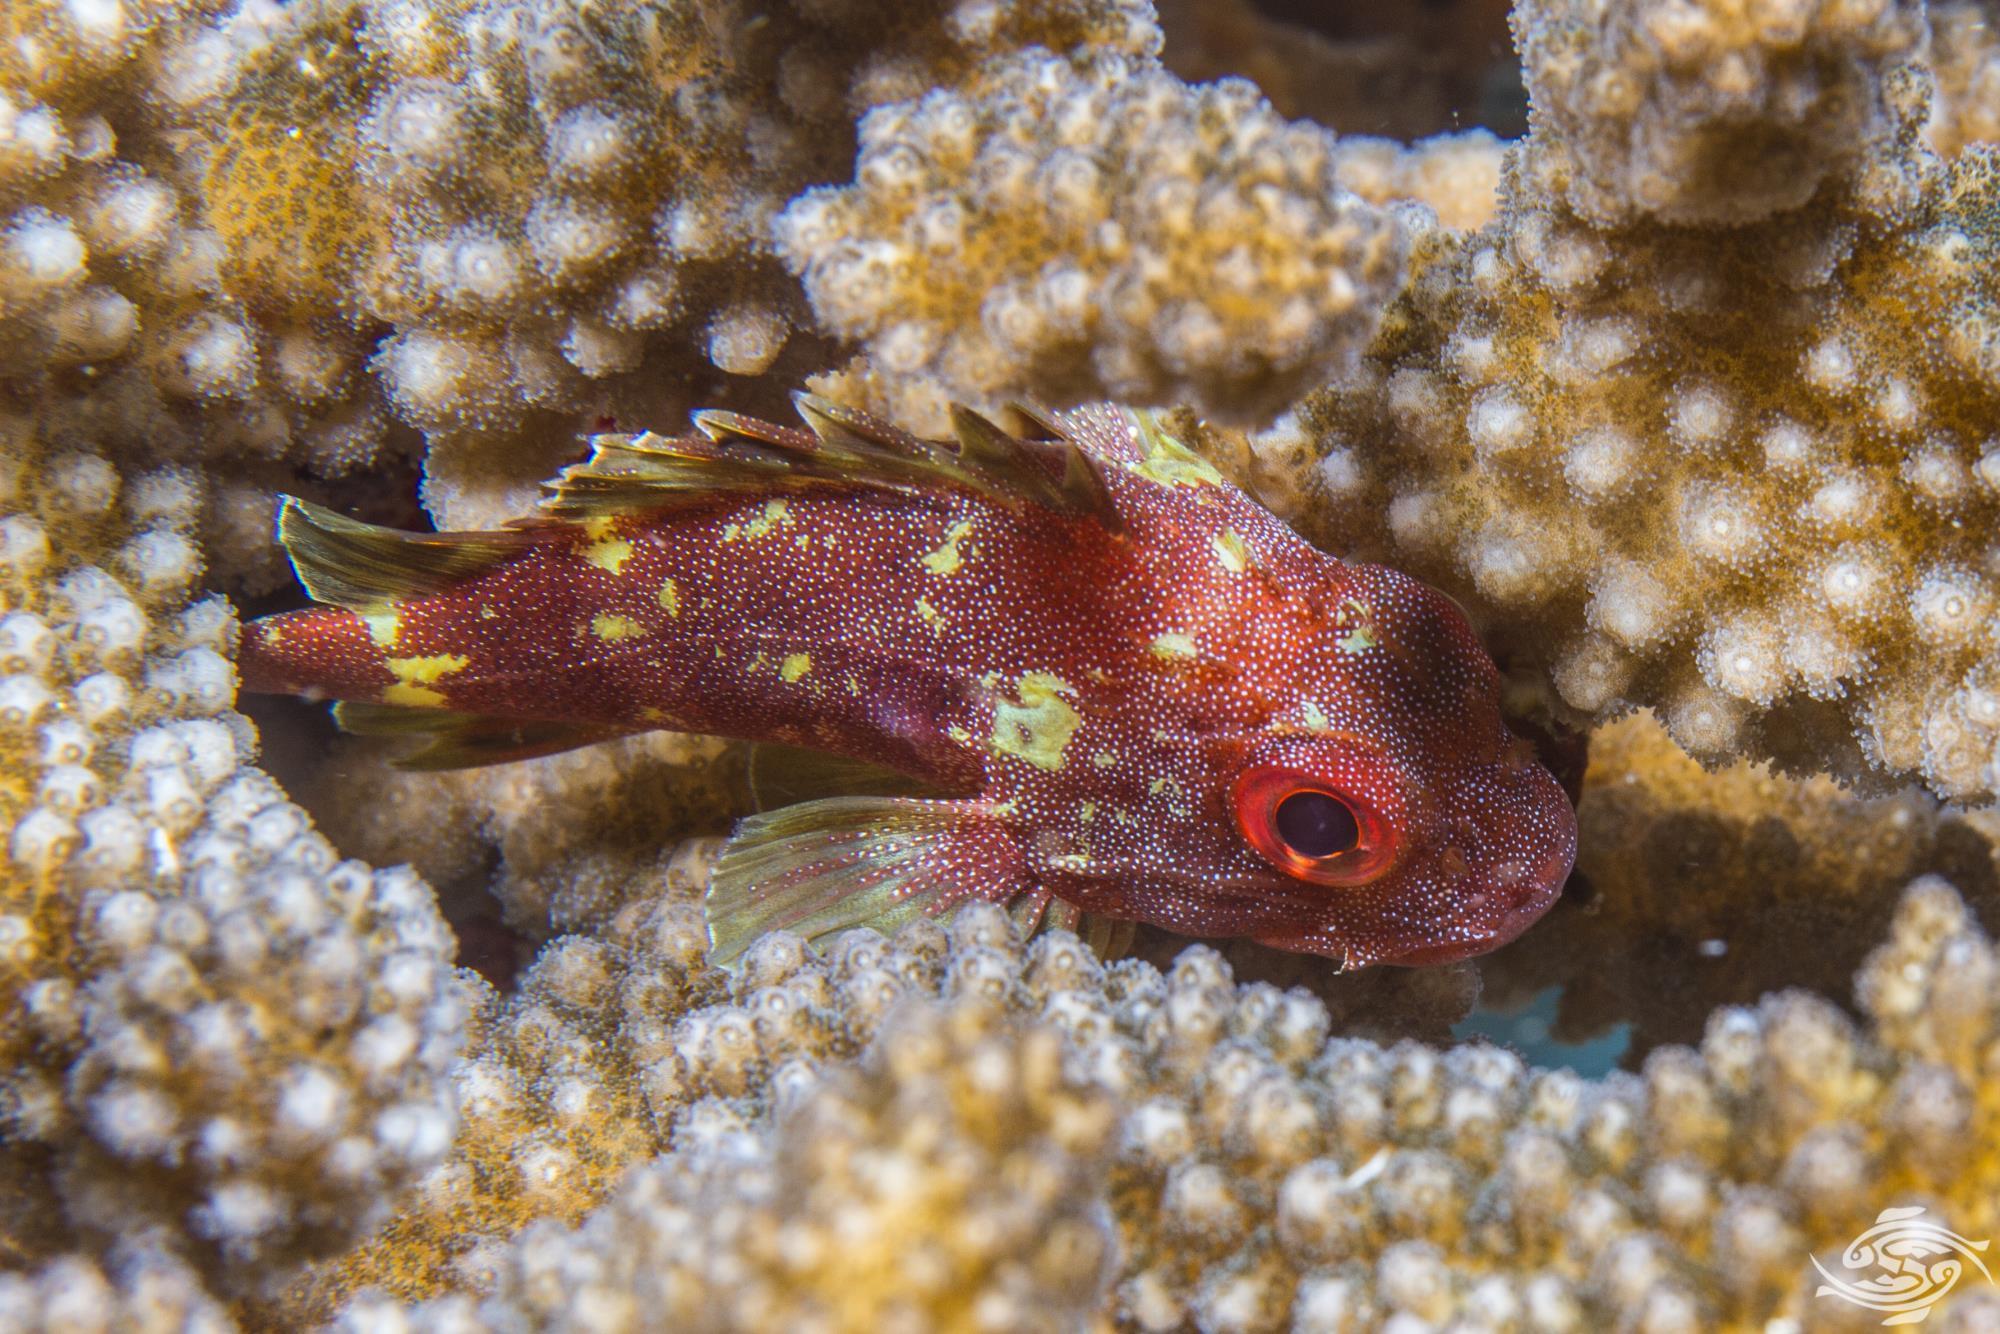 Yellow spotted scorpionfish, Sebastapistes cyanostigma